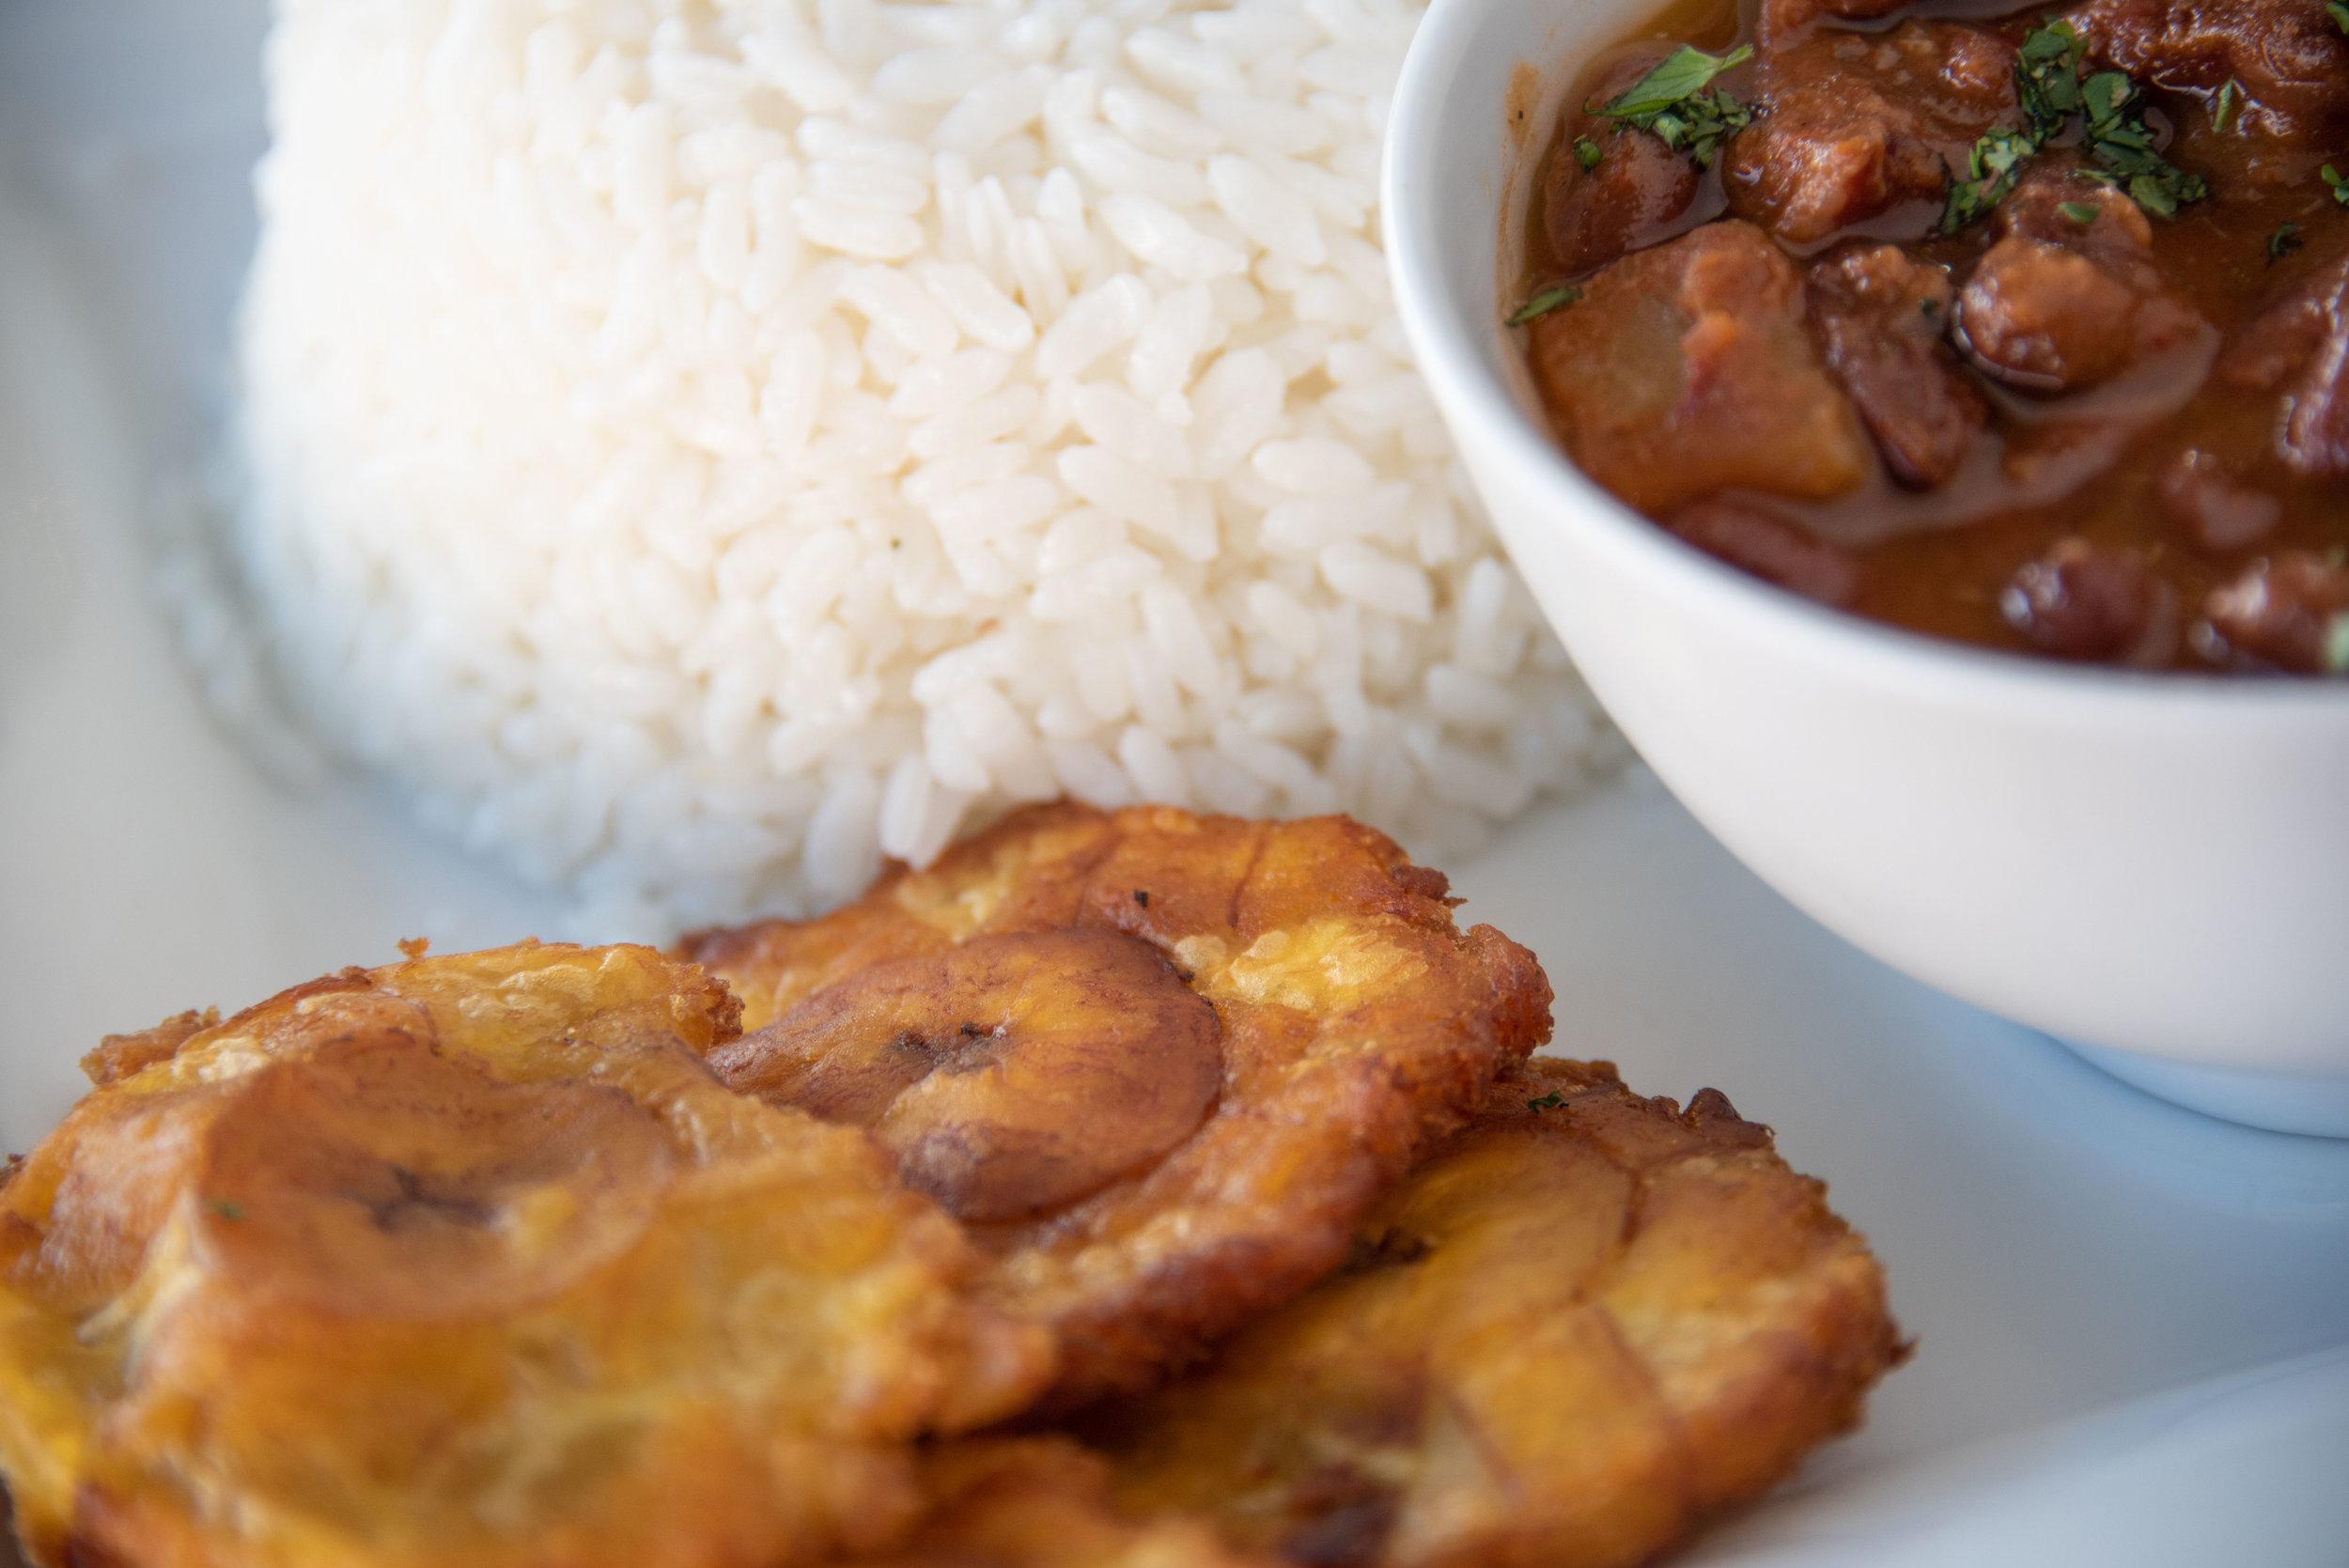 Warm bowl of Habichuelas, crispy Tostones and Arroz Blanco